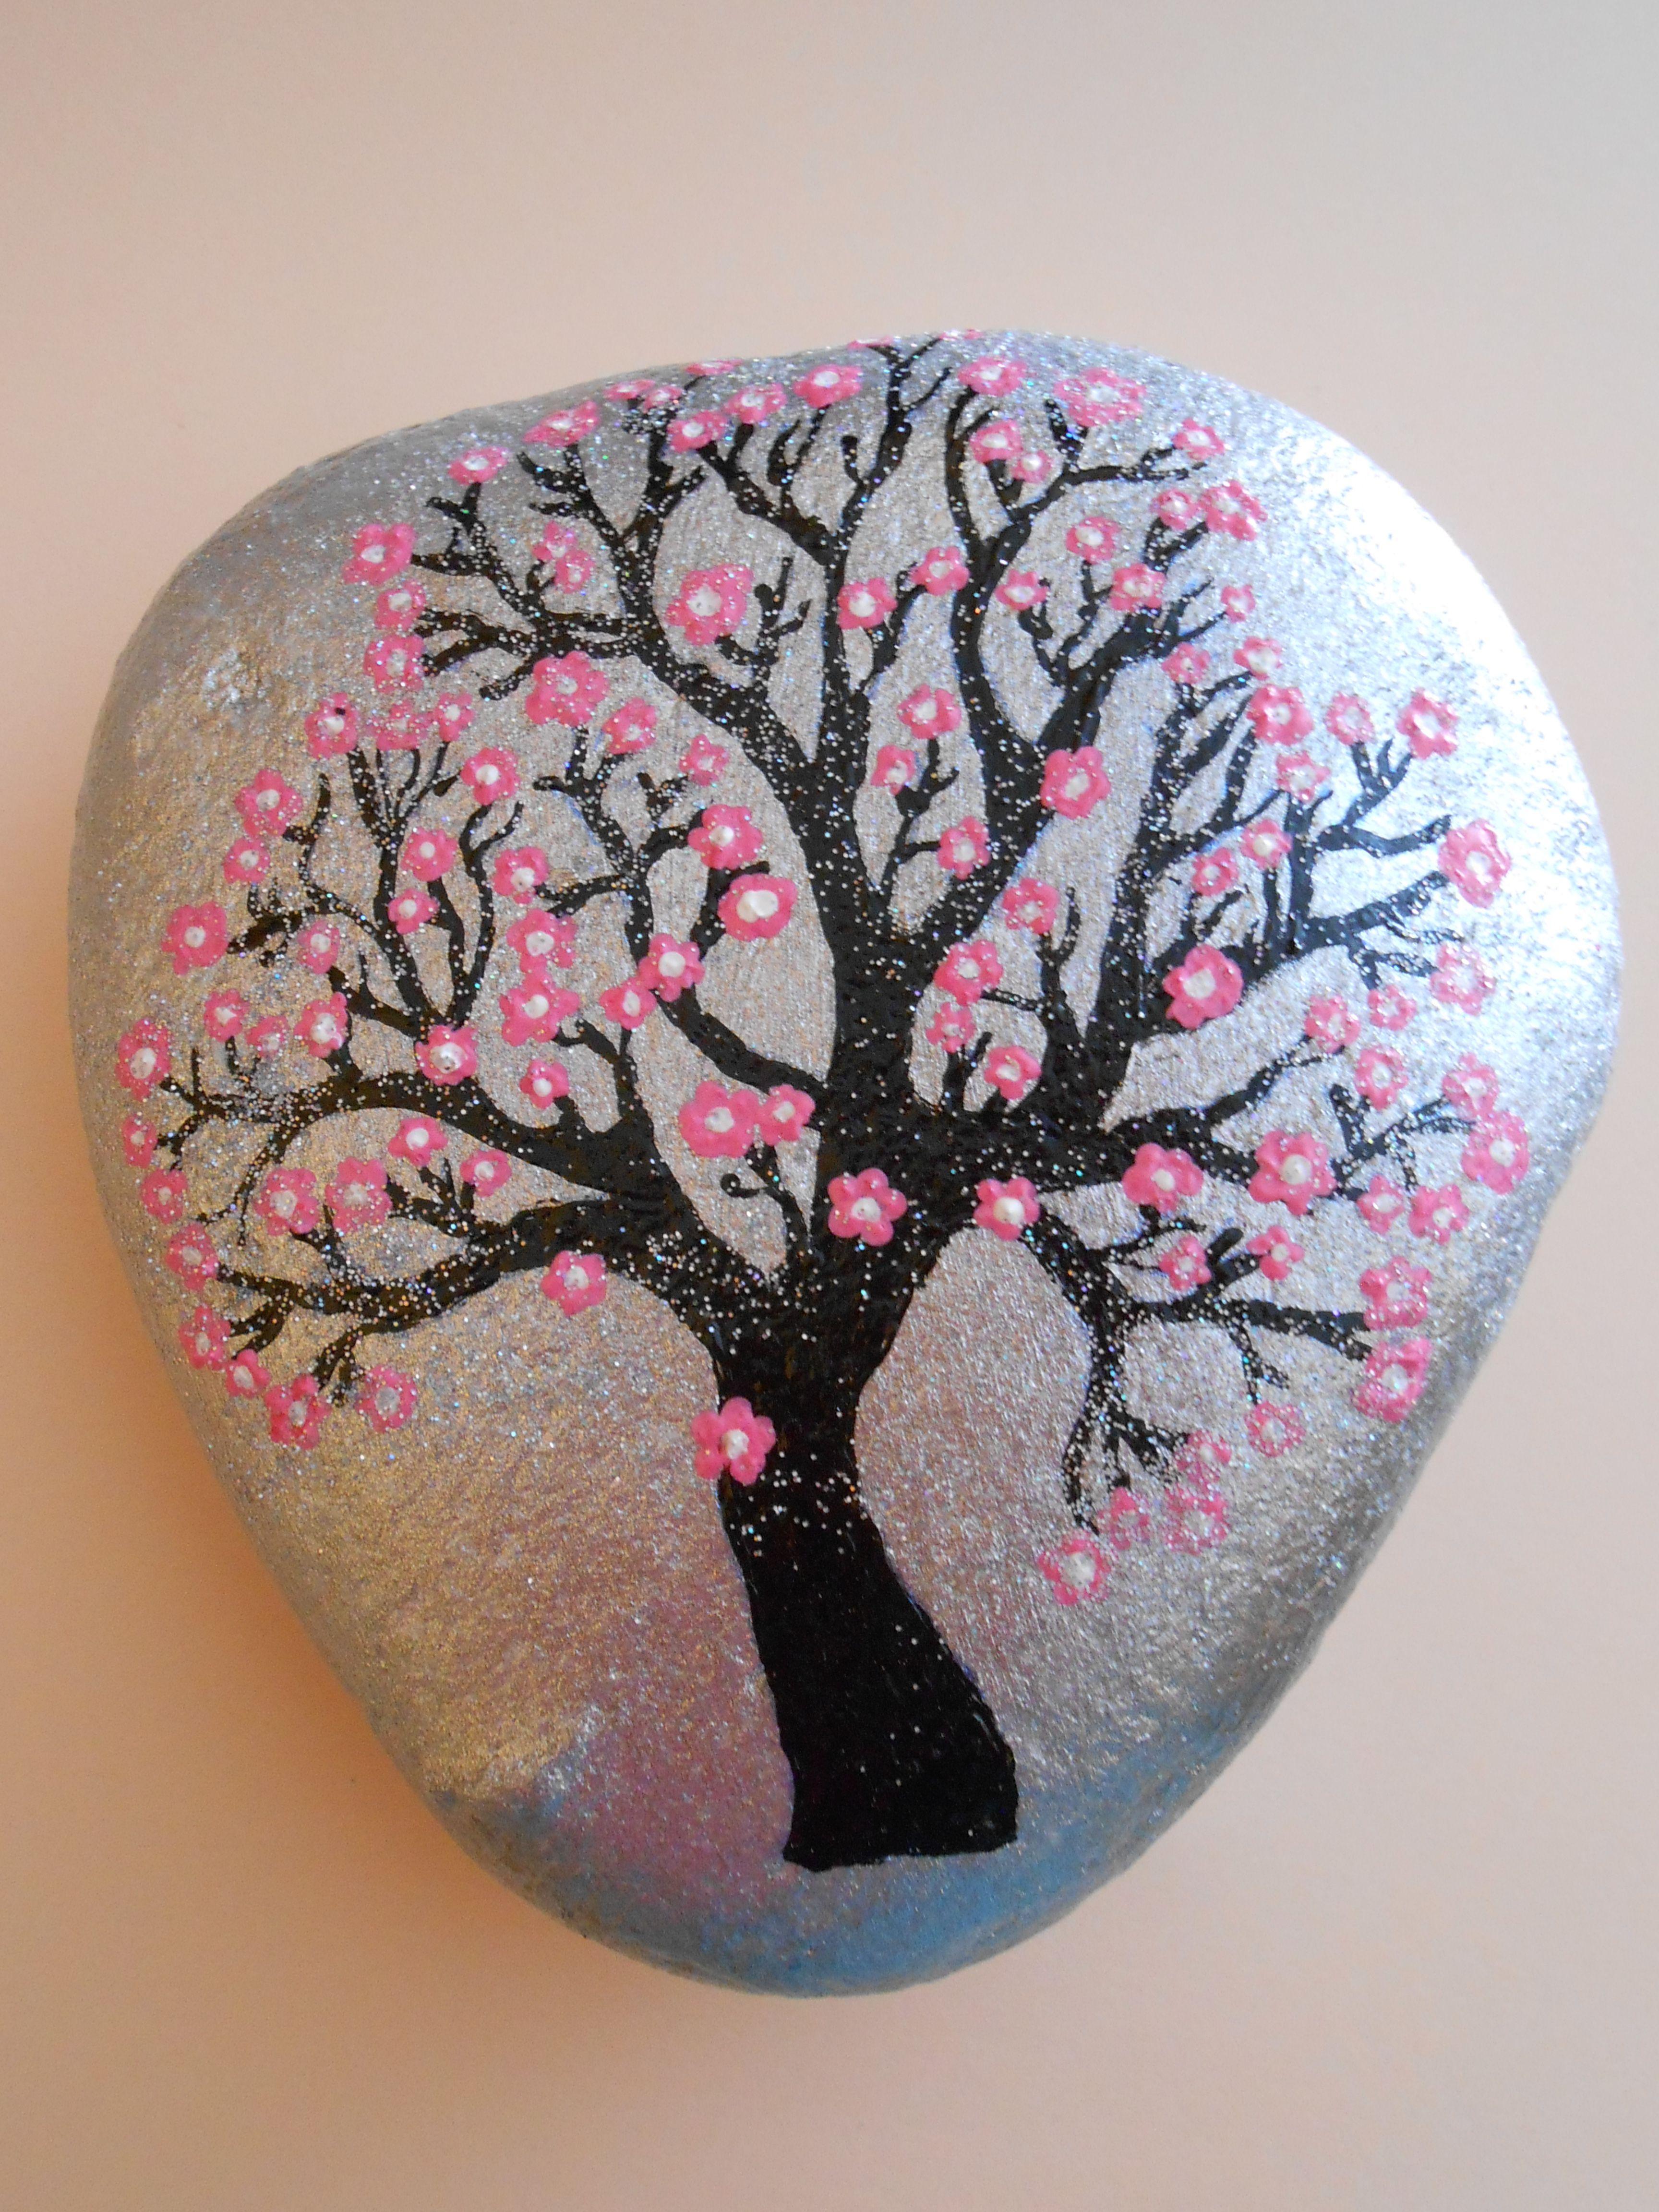 Stone painting Αlmond tree 2